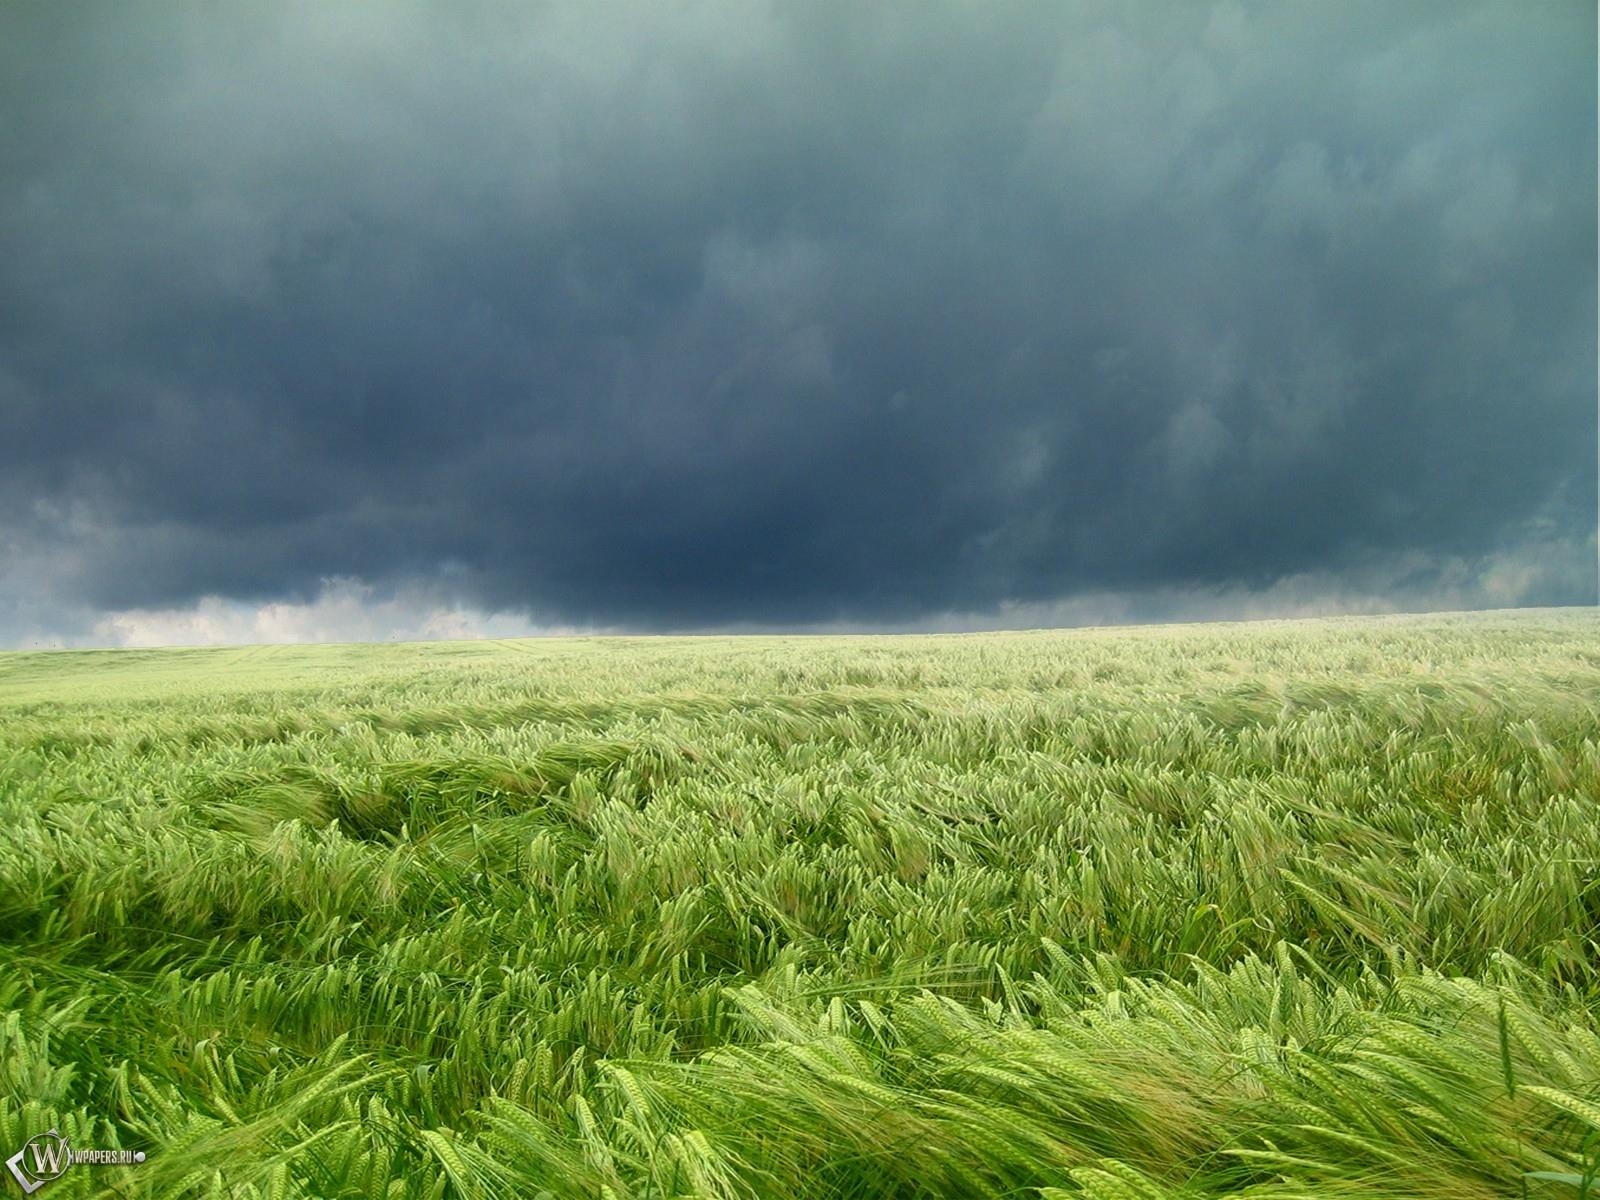 Ураган на поле 1600x1200